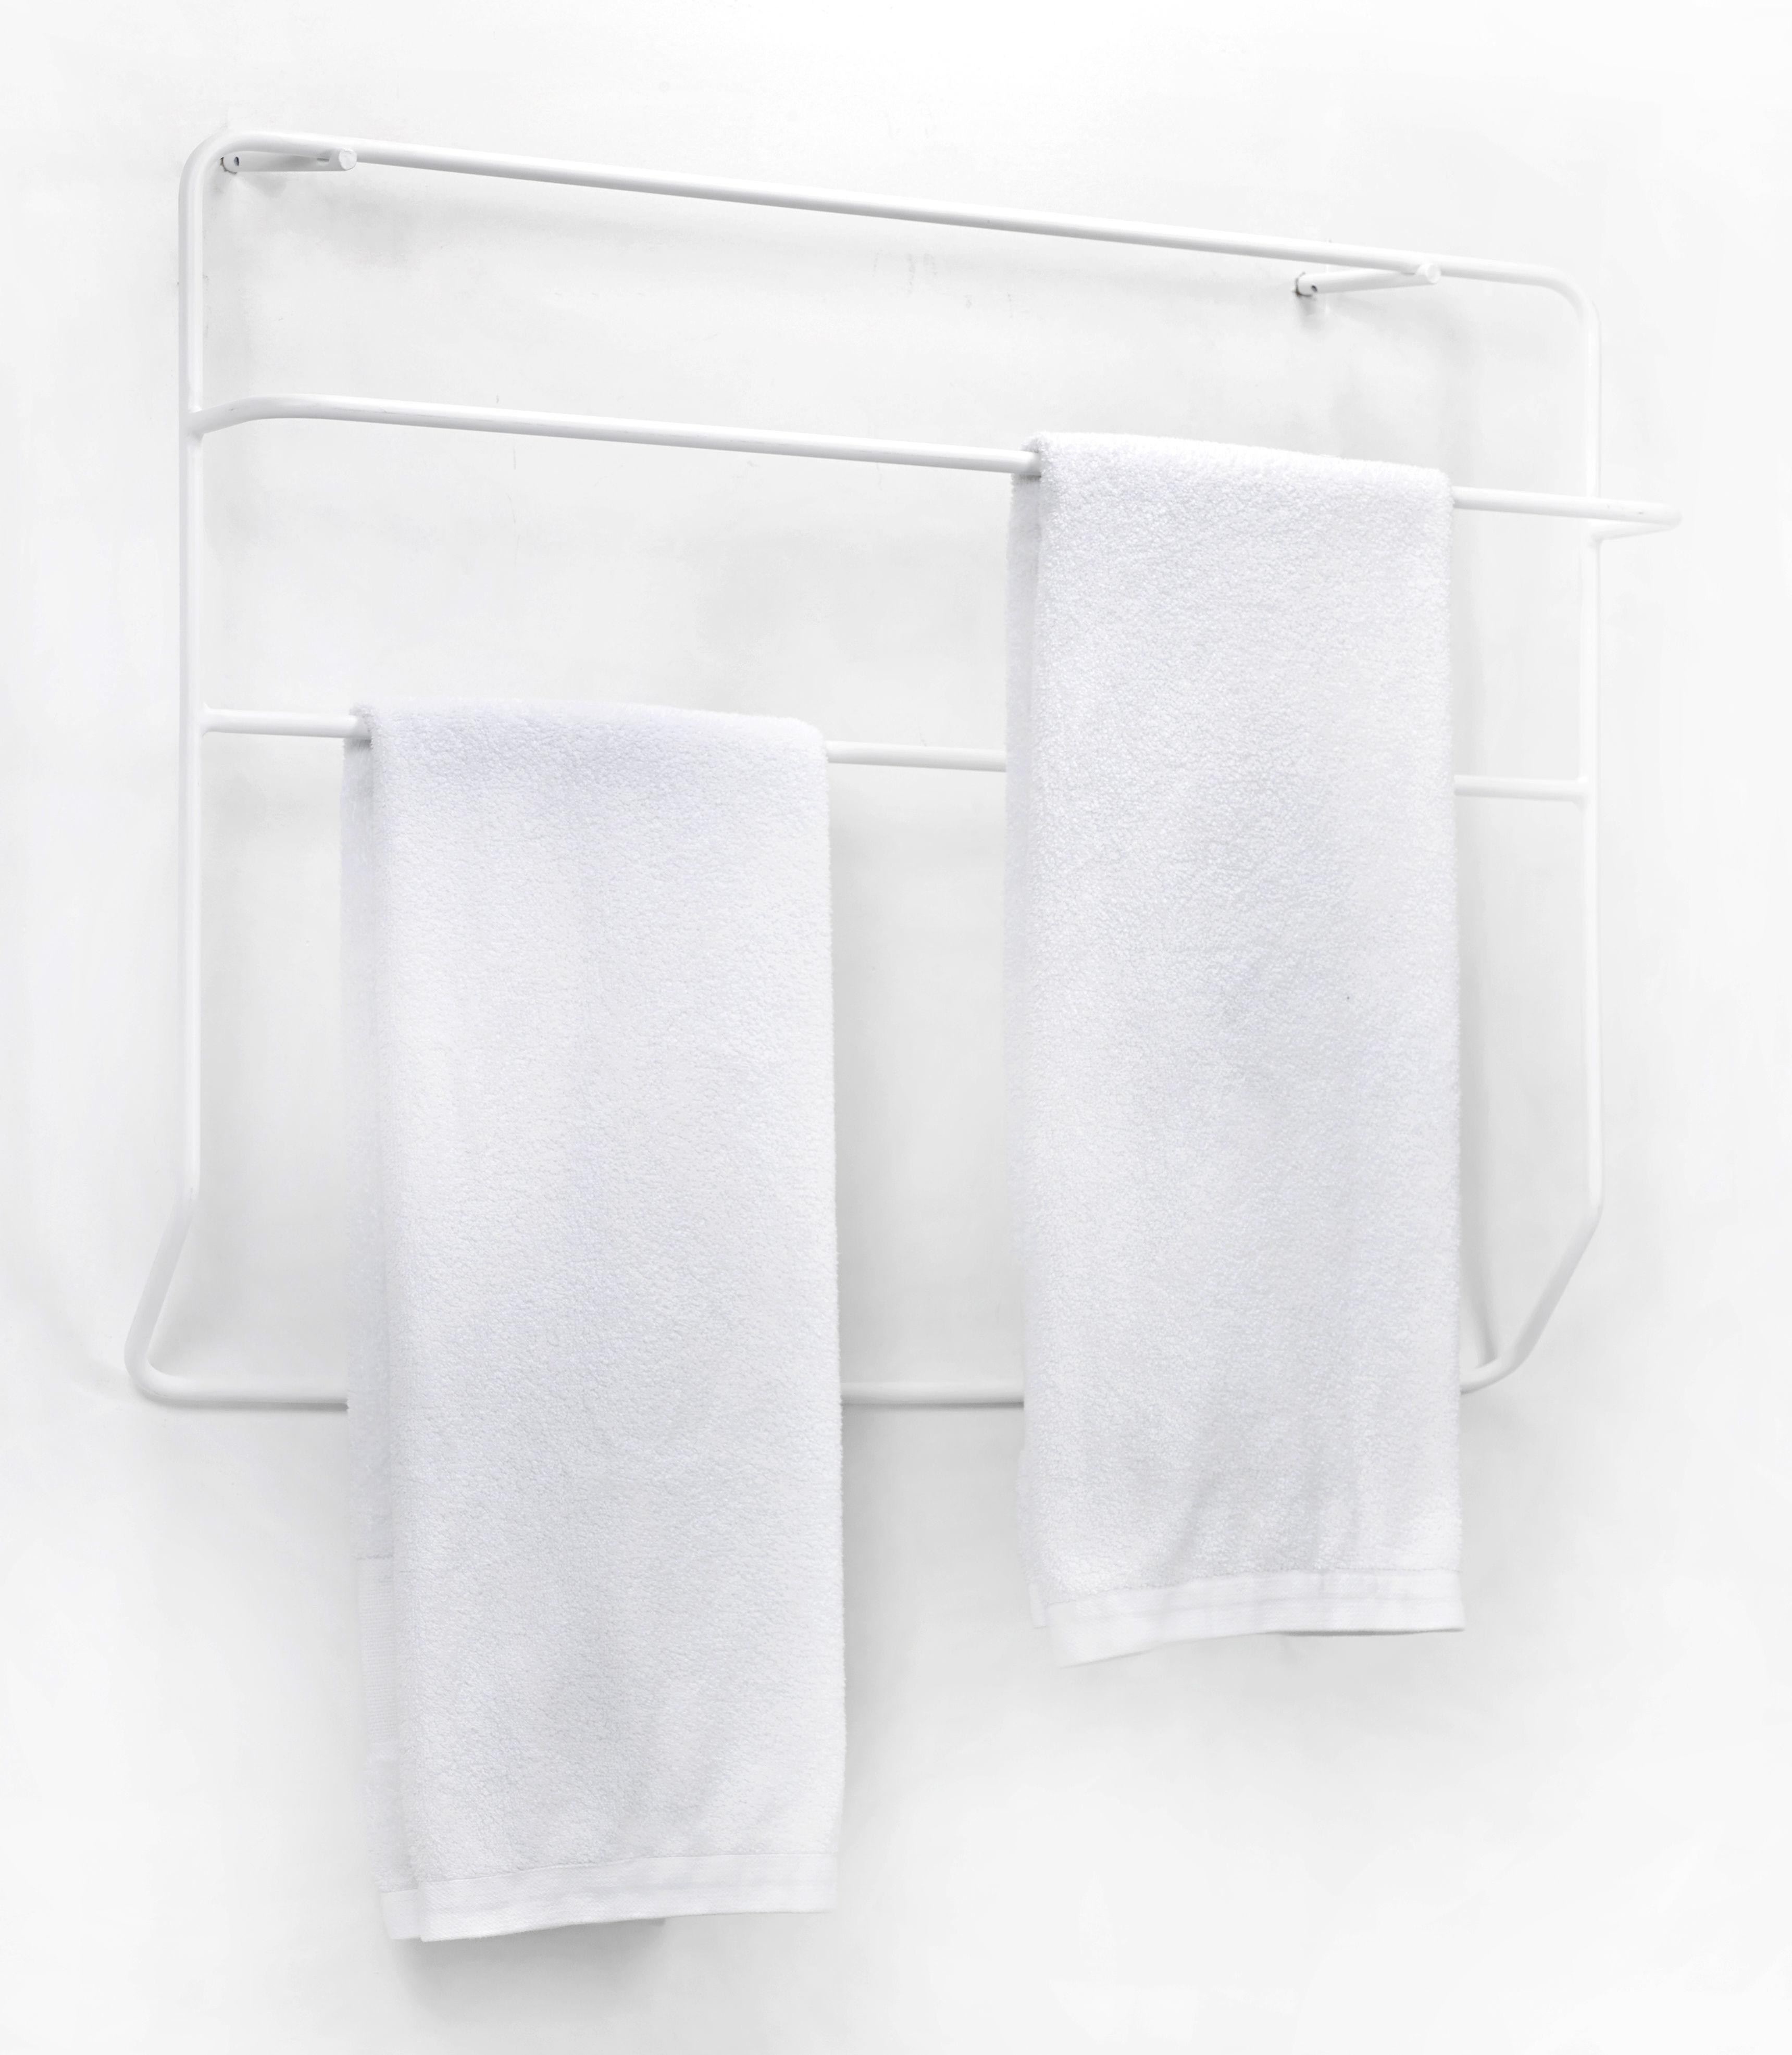 Wall-mounted Towel Rail Juno By Serax